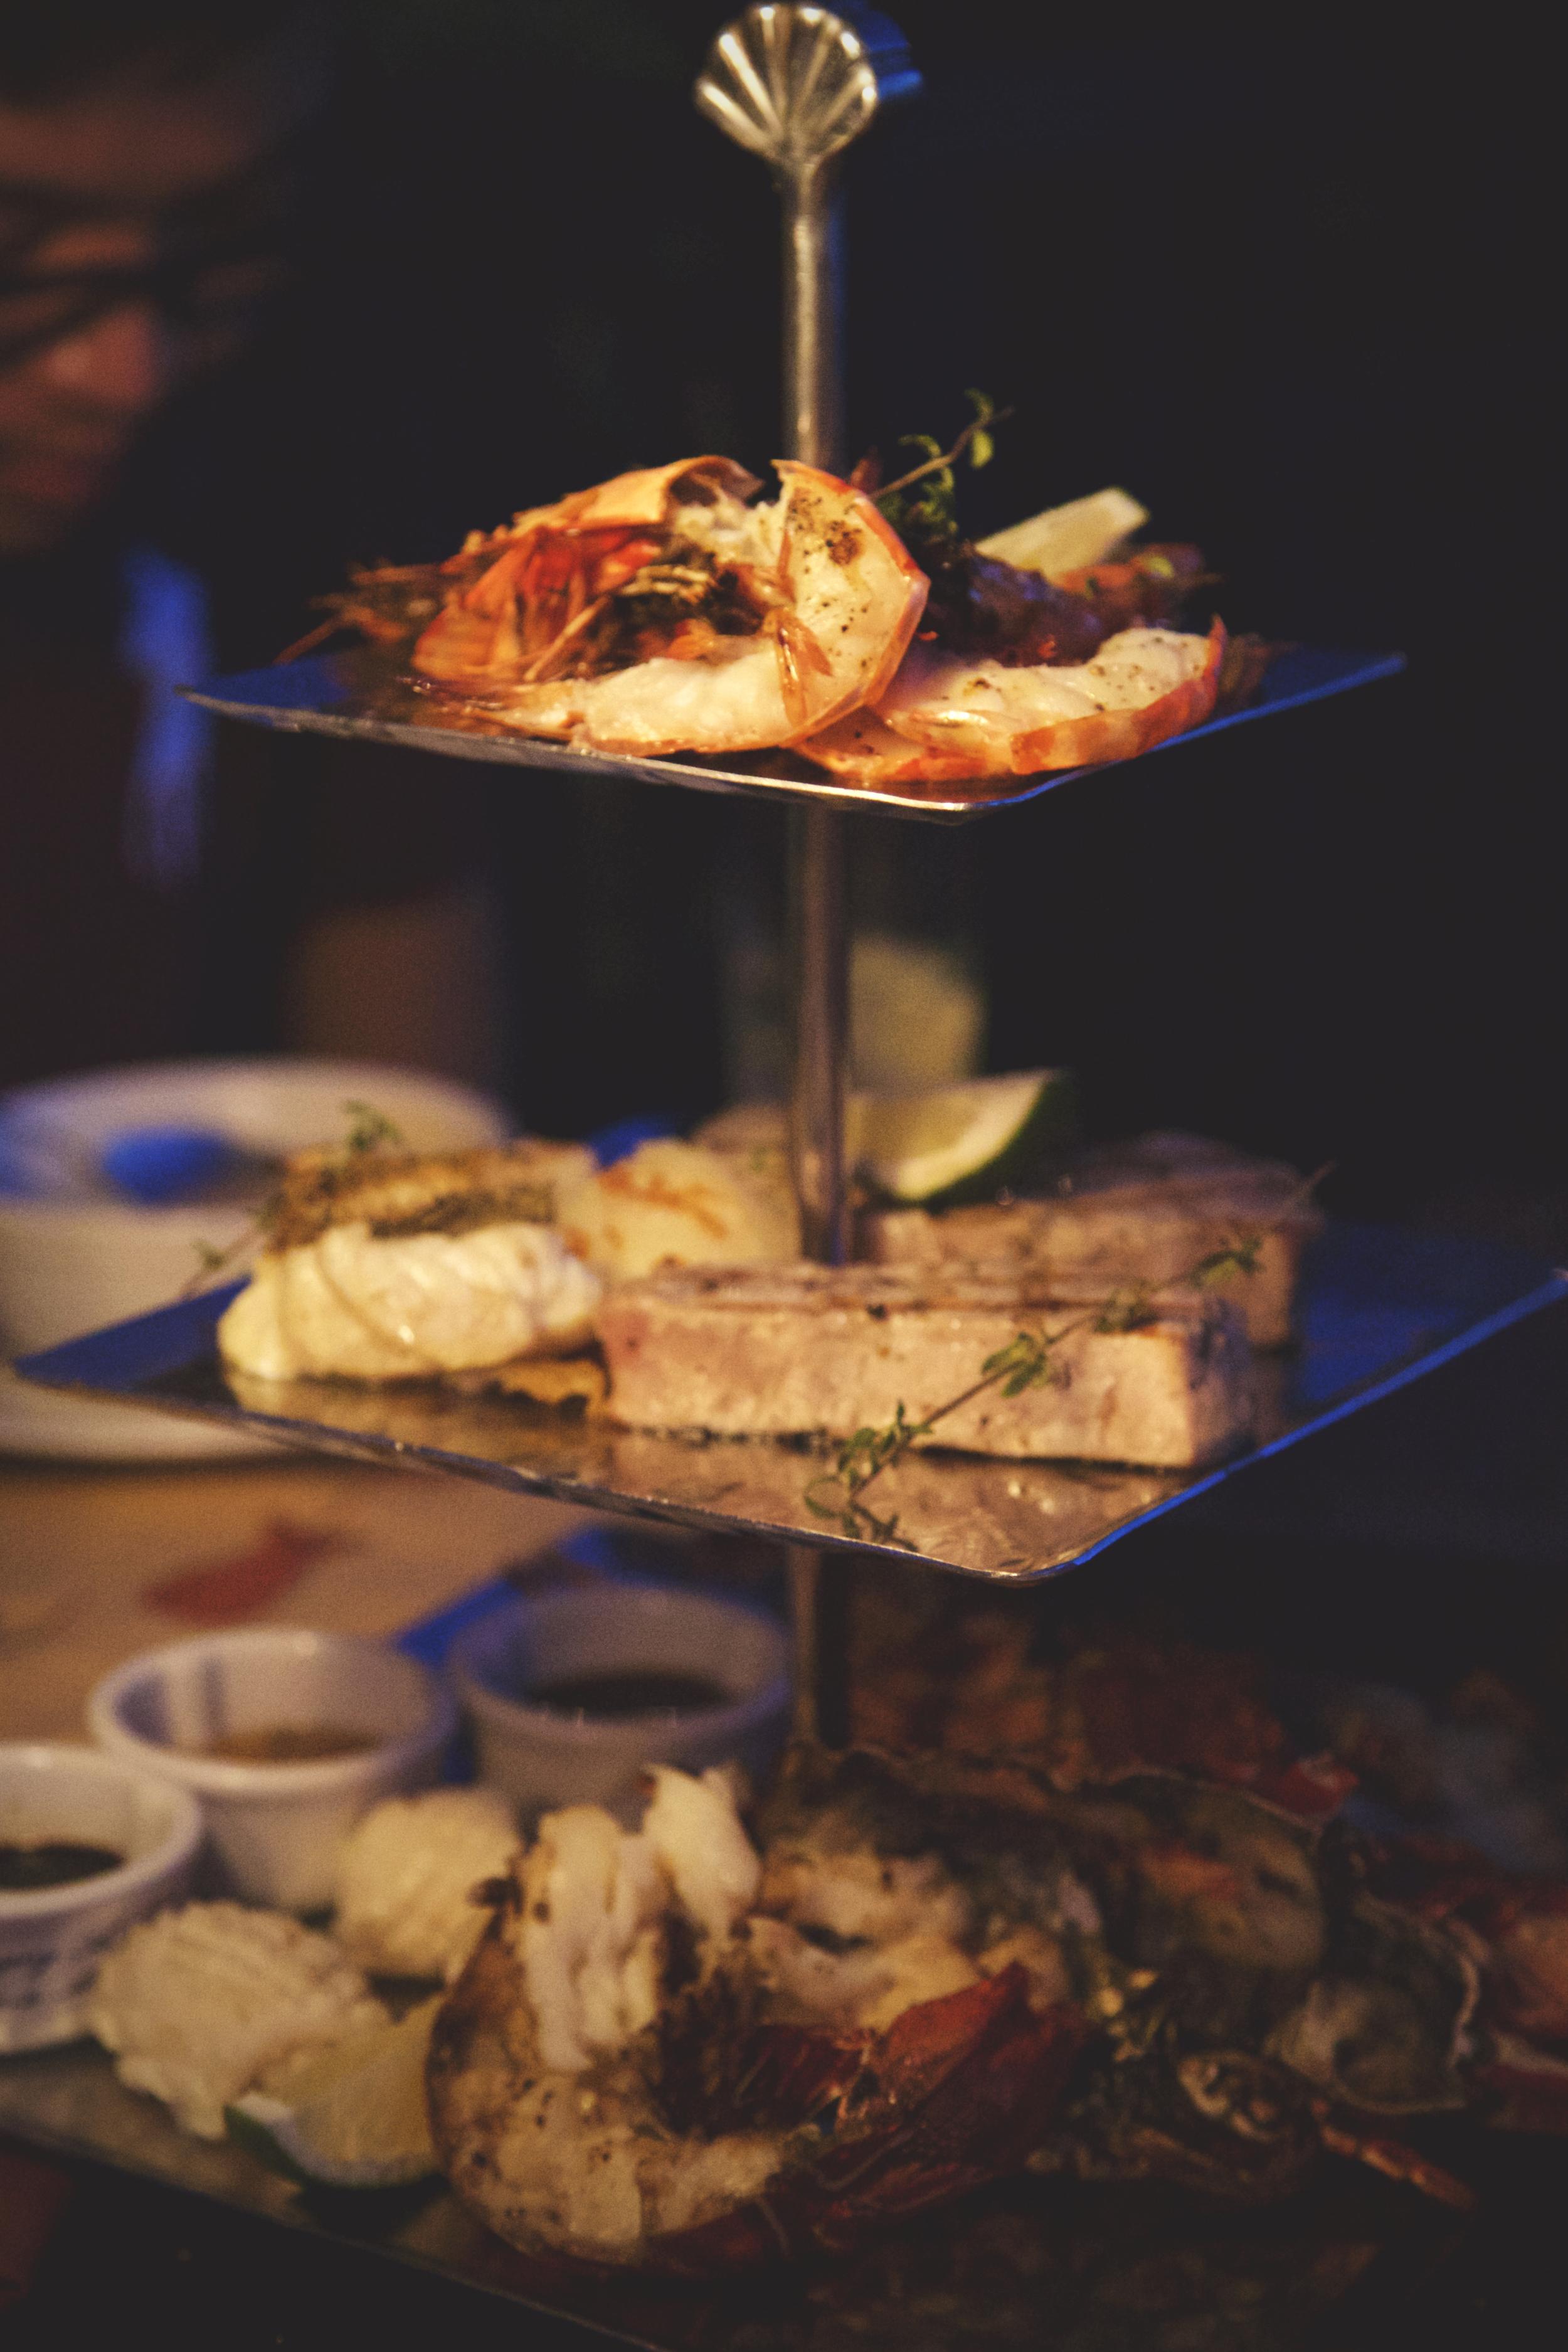 Fresh seafood, anyone?